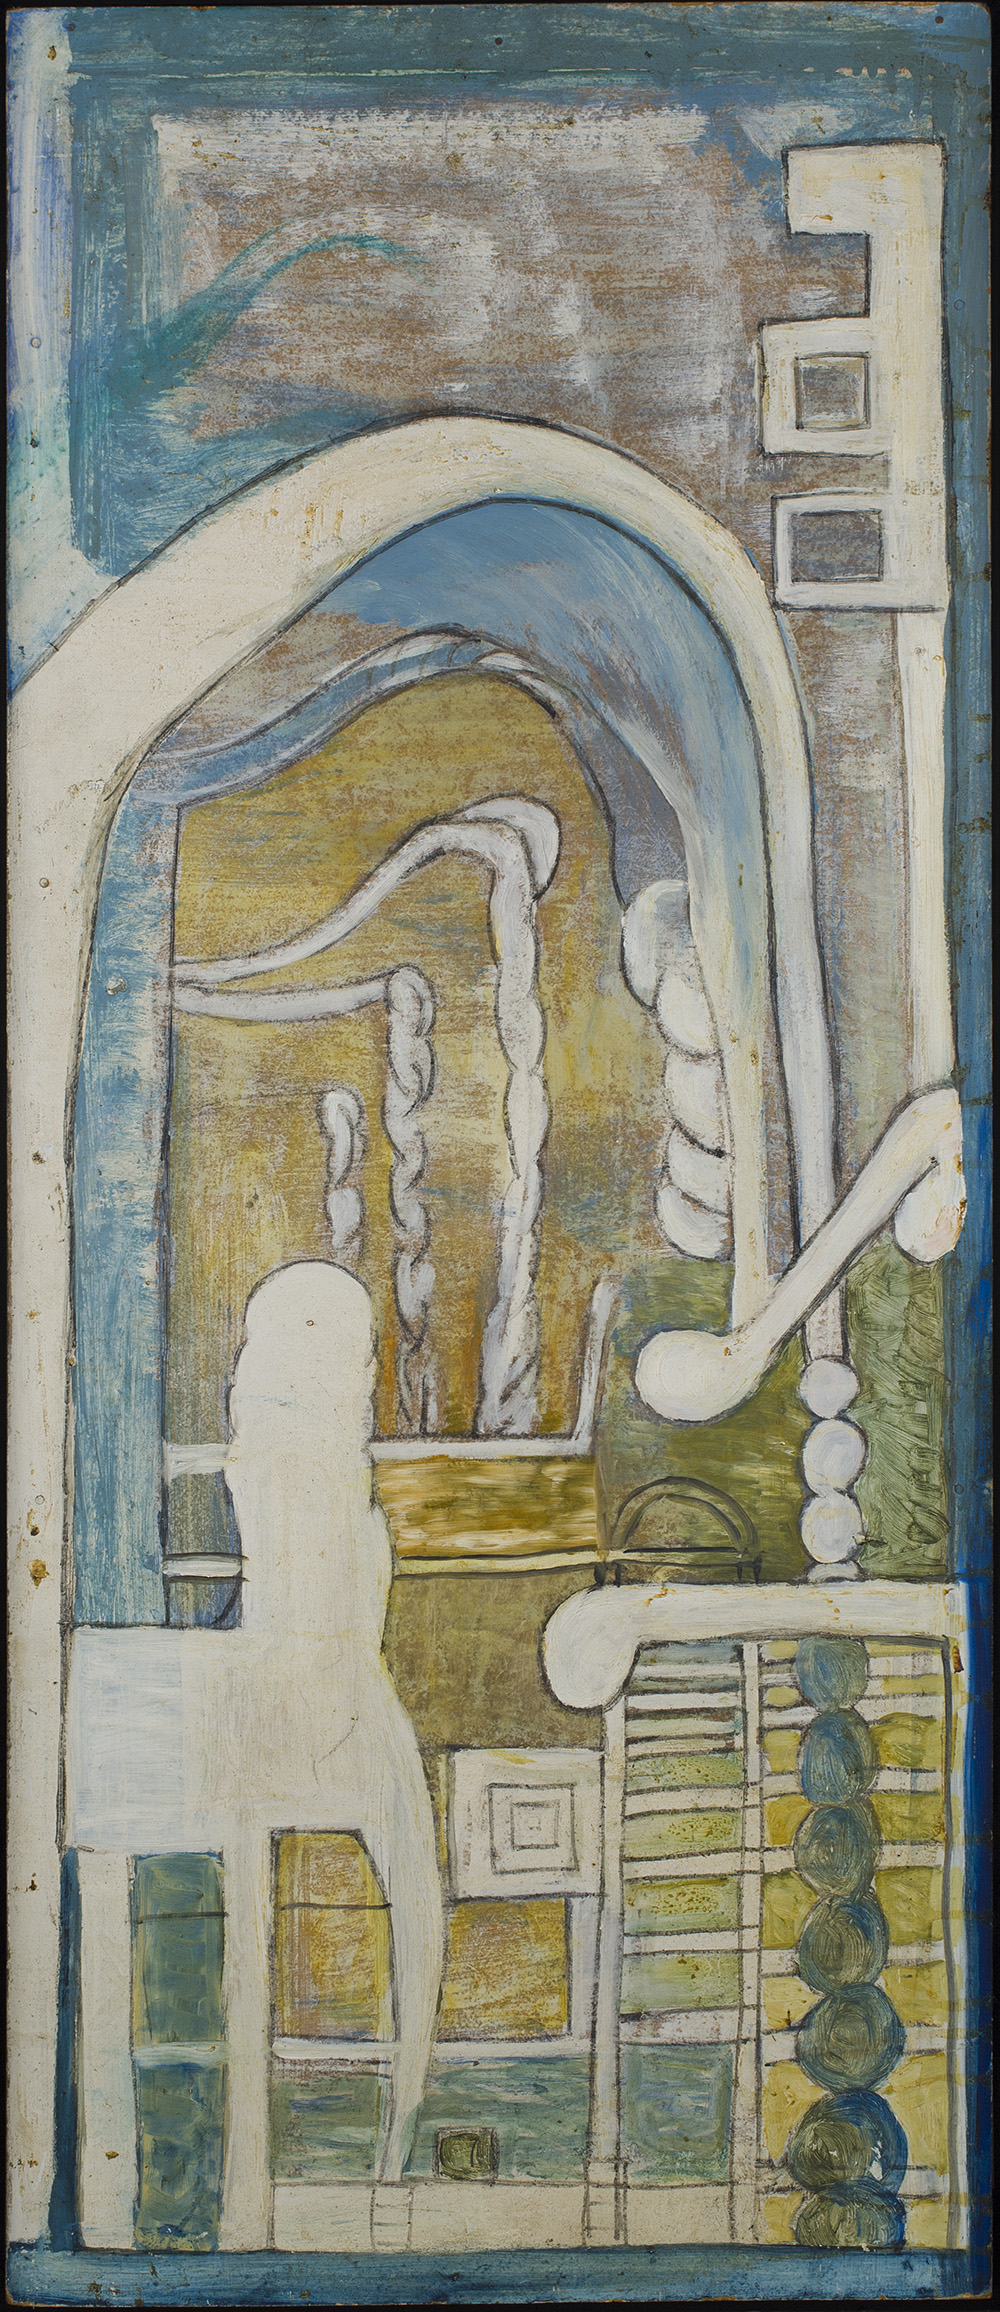 Jon Serl    Tall Harmony  , n.d. Oil on board 42.5 x 18.5 inches 108 x 47 cm SJ 111